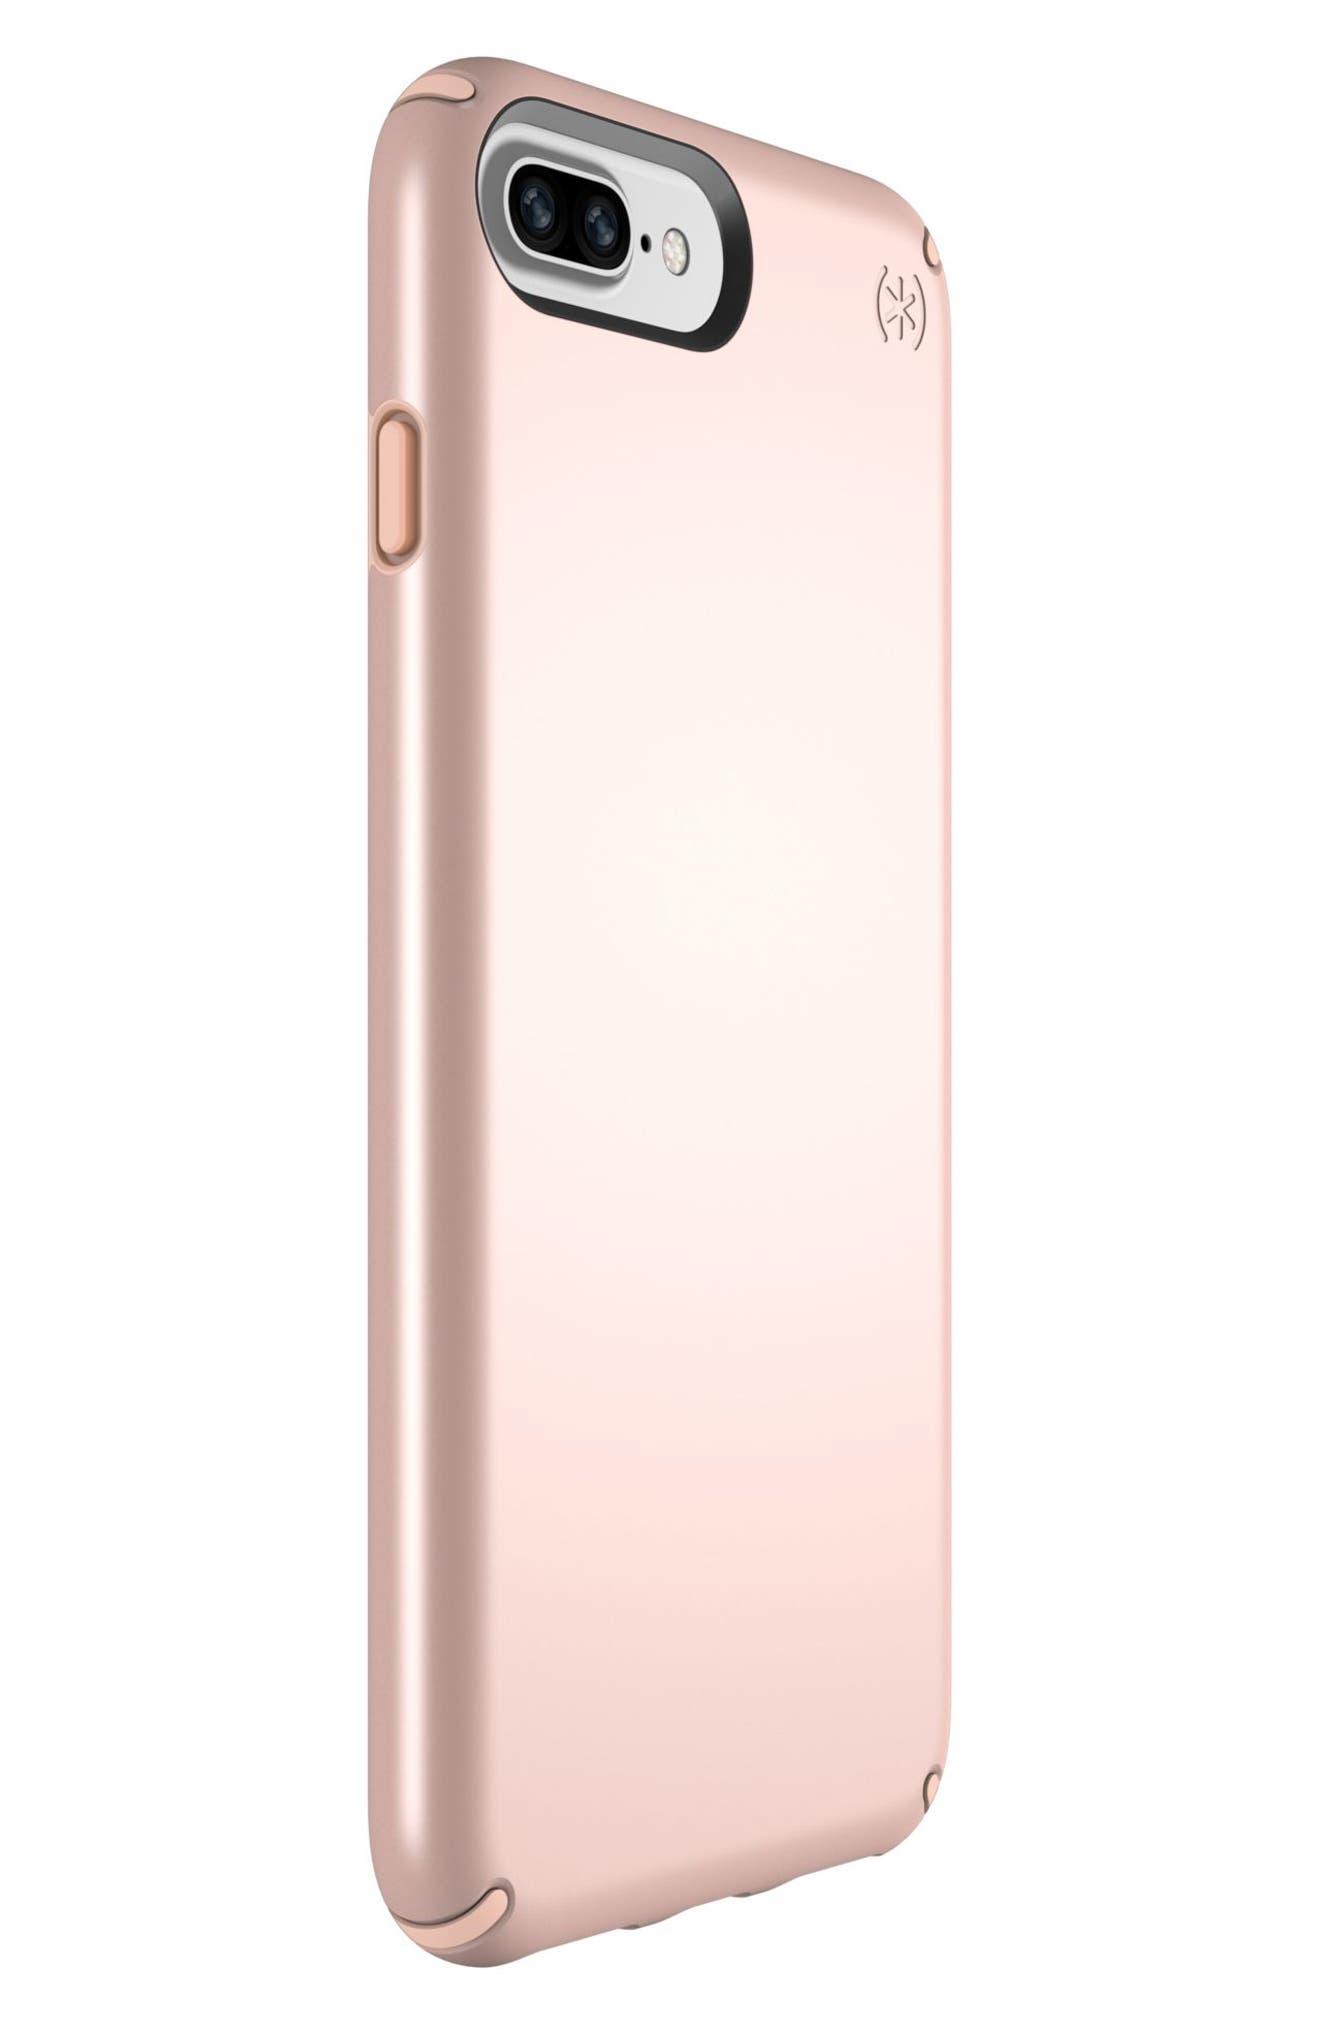 iPhone 6/6s/7/8 Plus Case,                             Alternate thumbnail 4, color,                             Rose Gold Metallic/ Peach